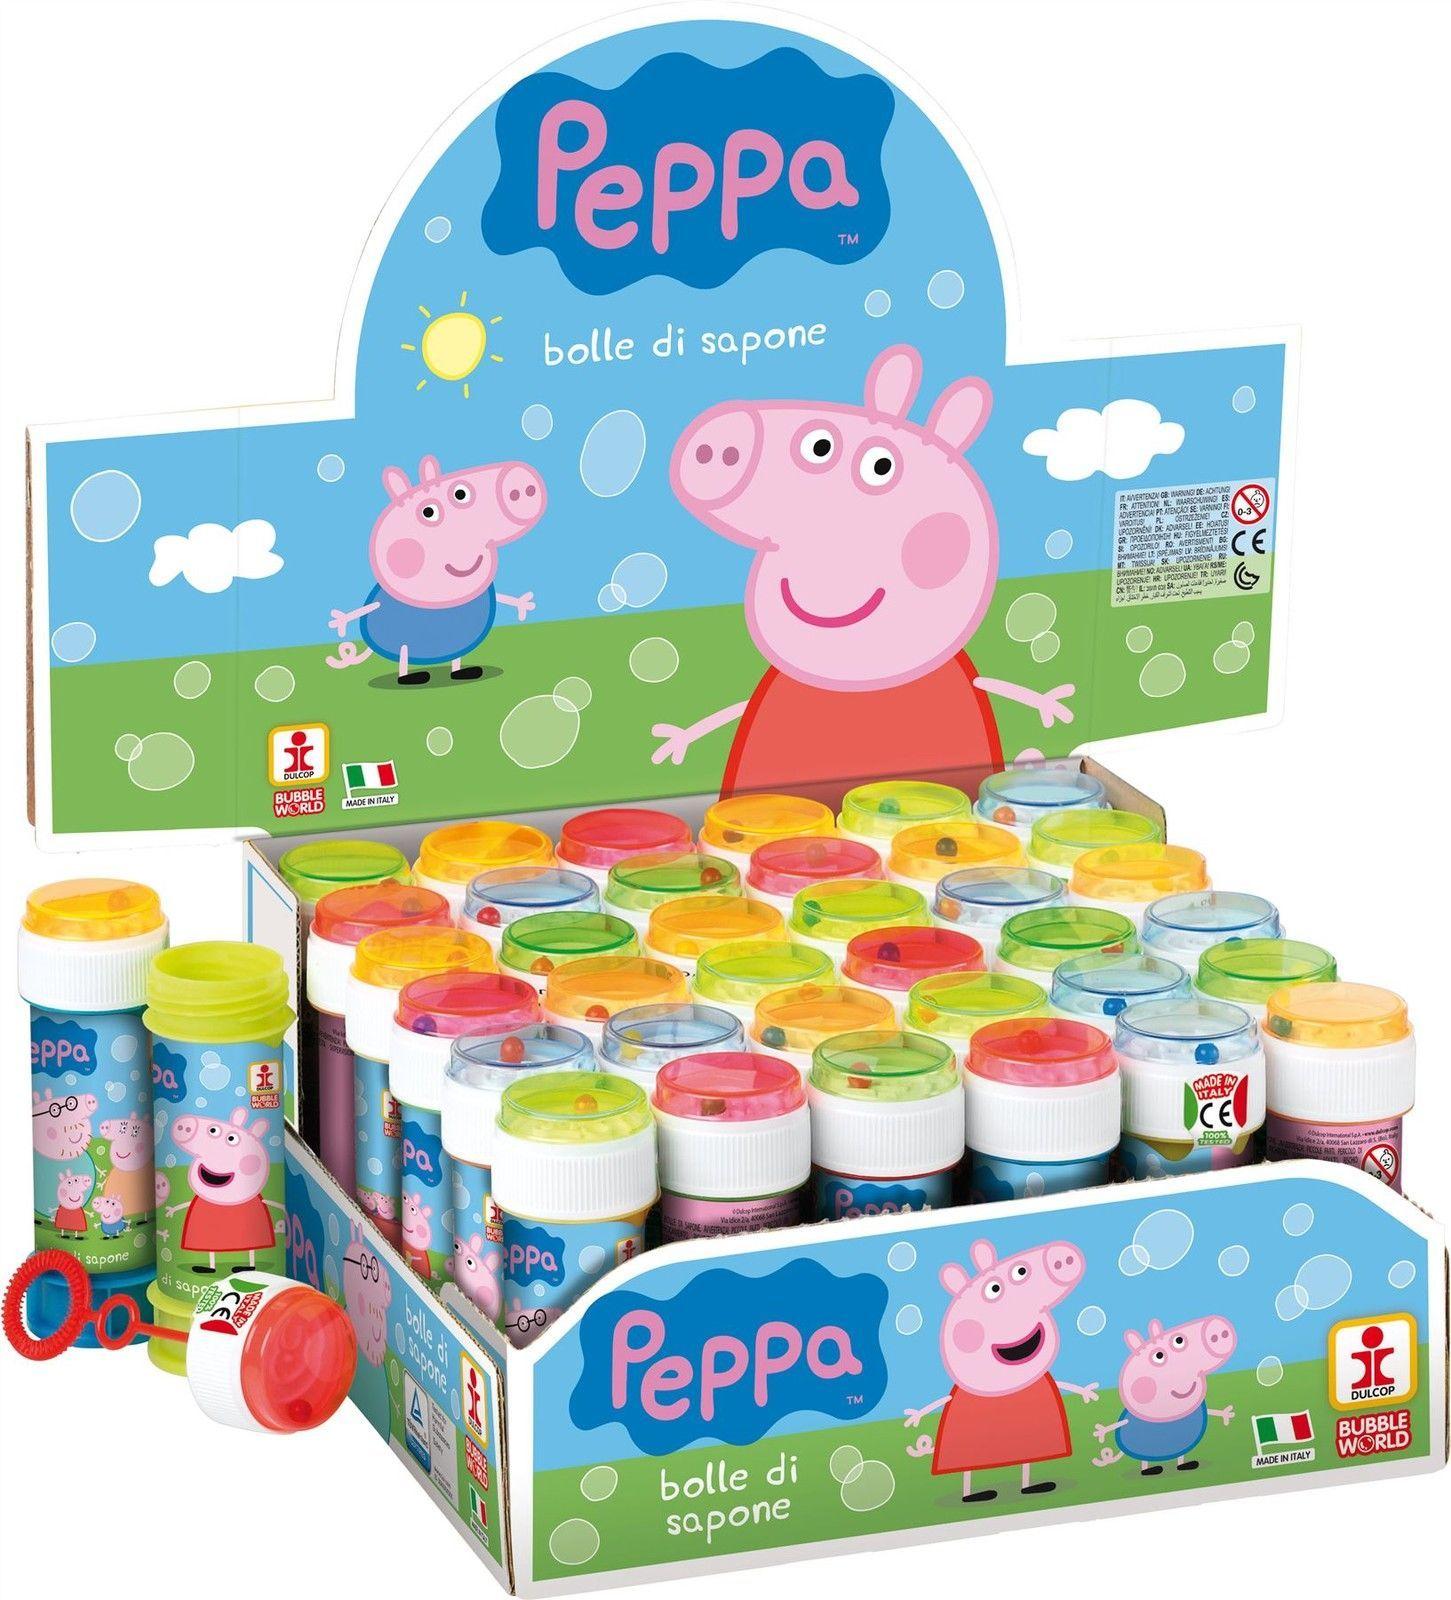 Peppa Pig Bubbles Bubble Tubs Childrens Party Bag Filler Puzzle Maze ...